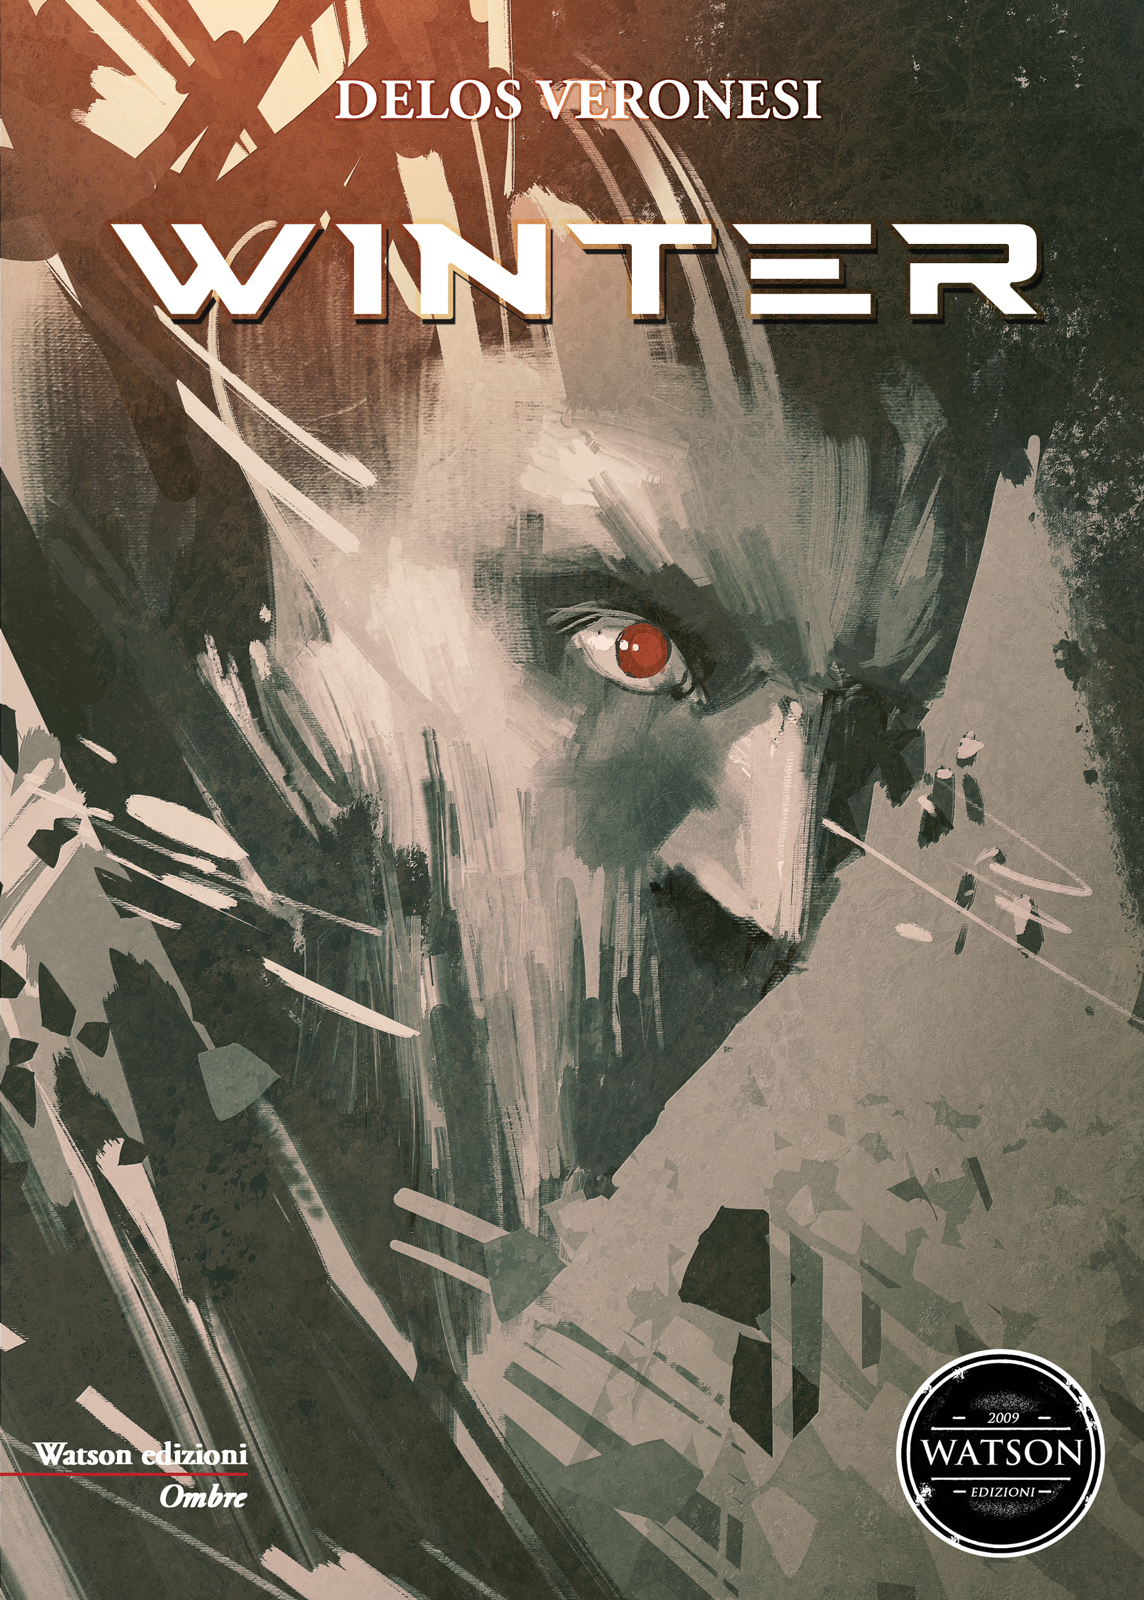 Delos Veronesi - Winter (Watson, 2016) 12 - fanzine